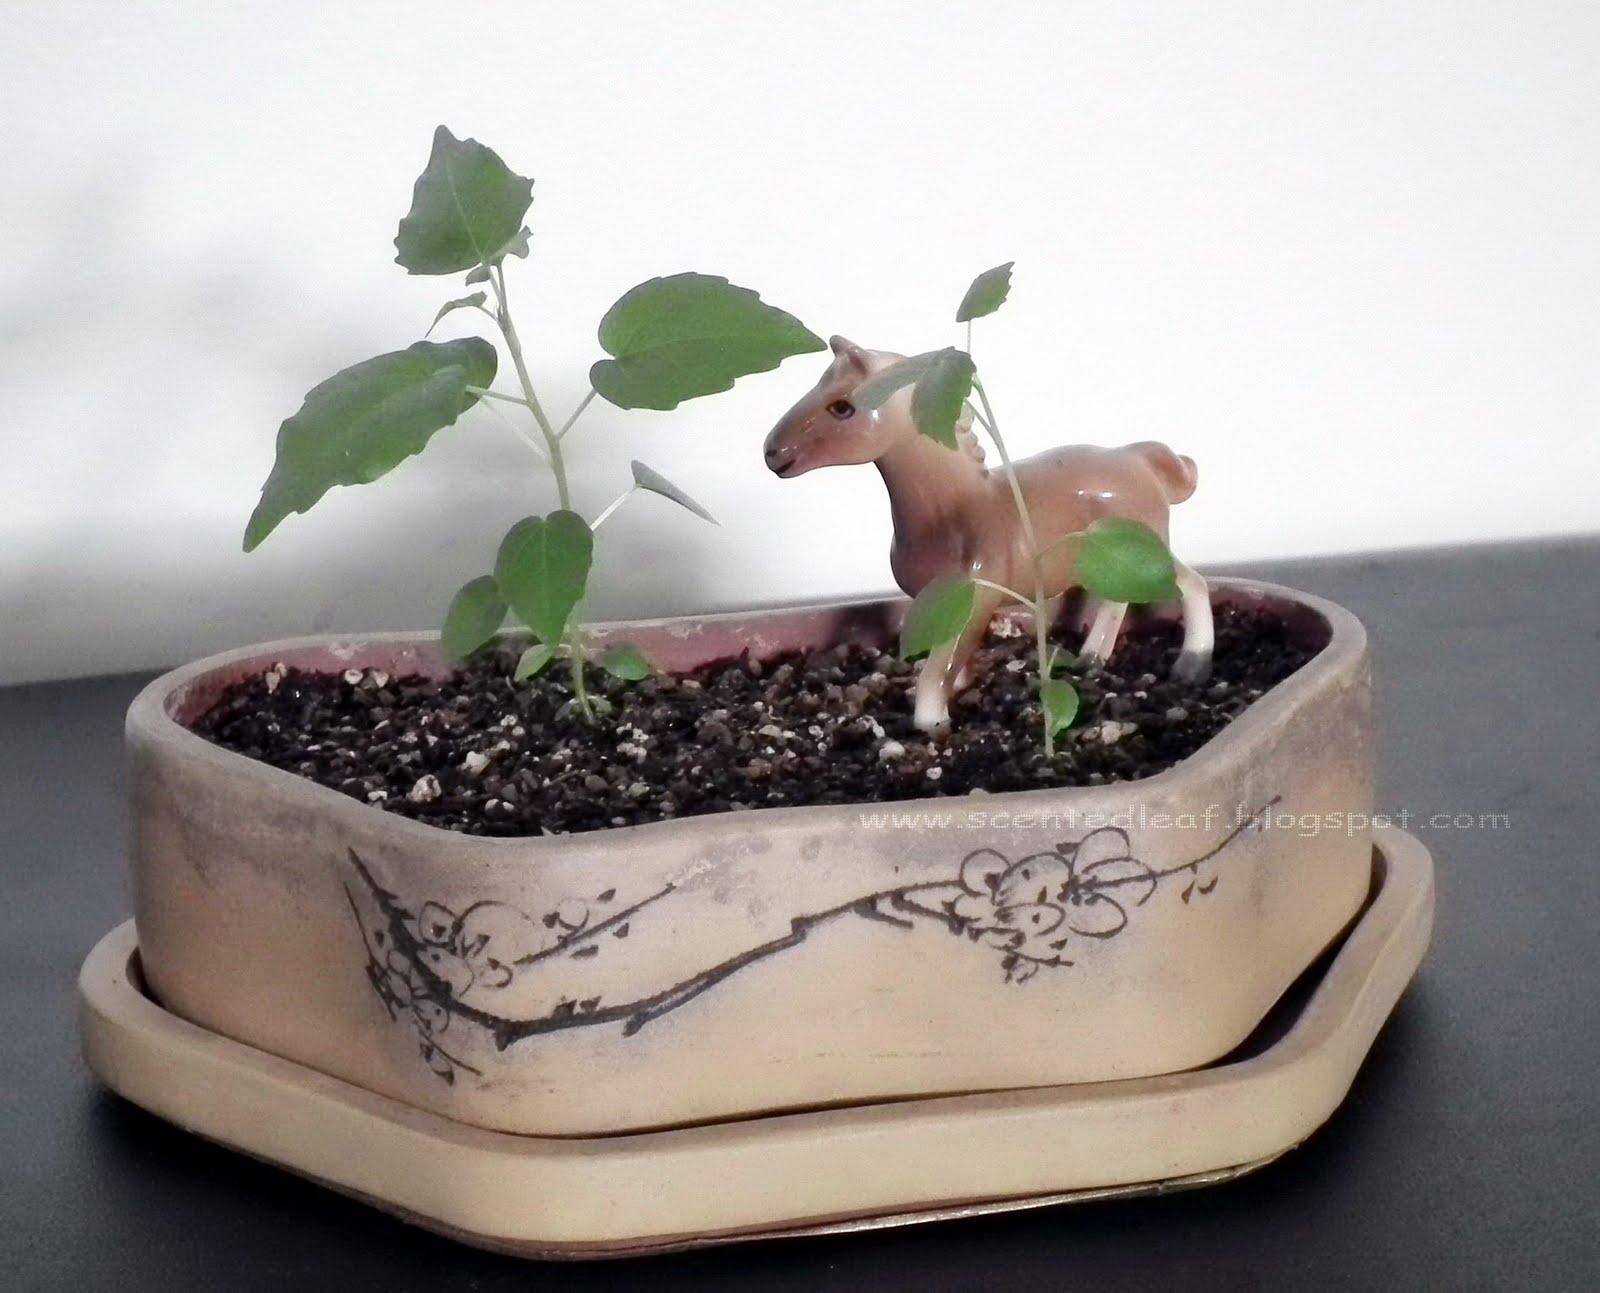 Scented Leaf Ficus Religiosa Seedlings